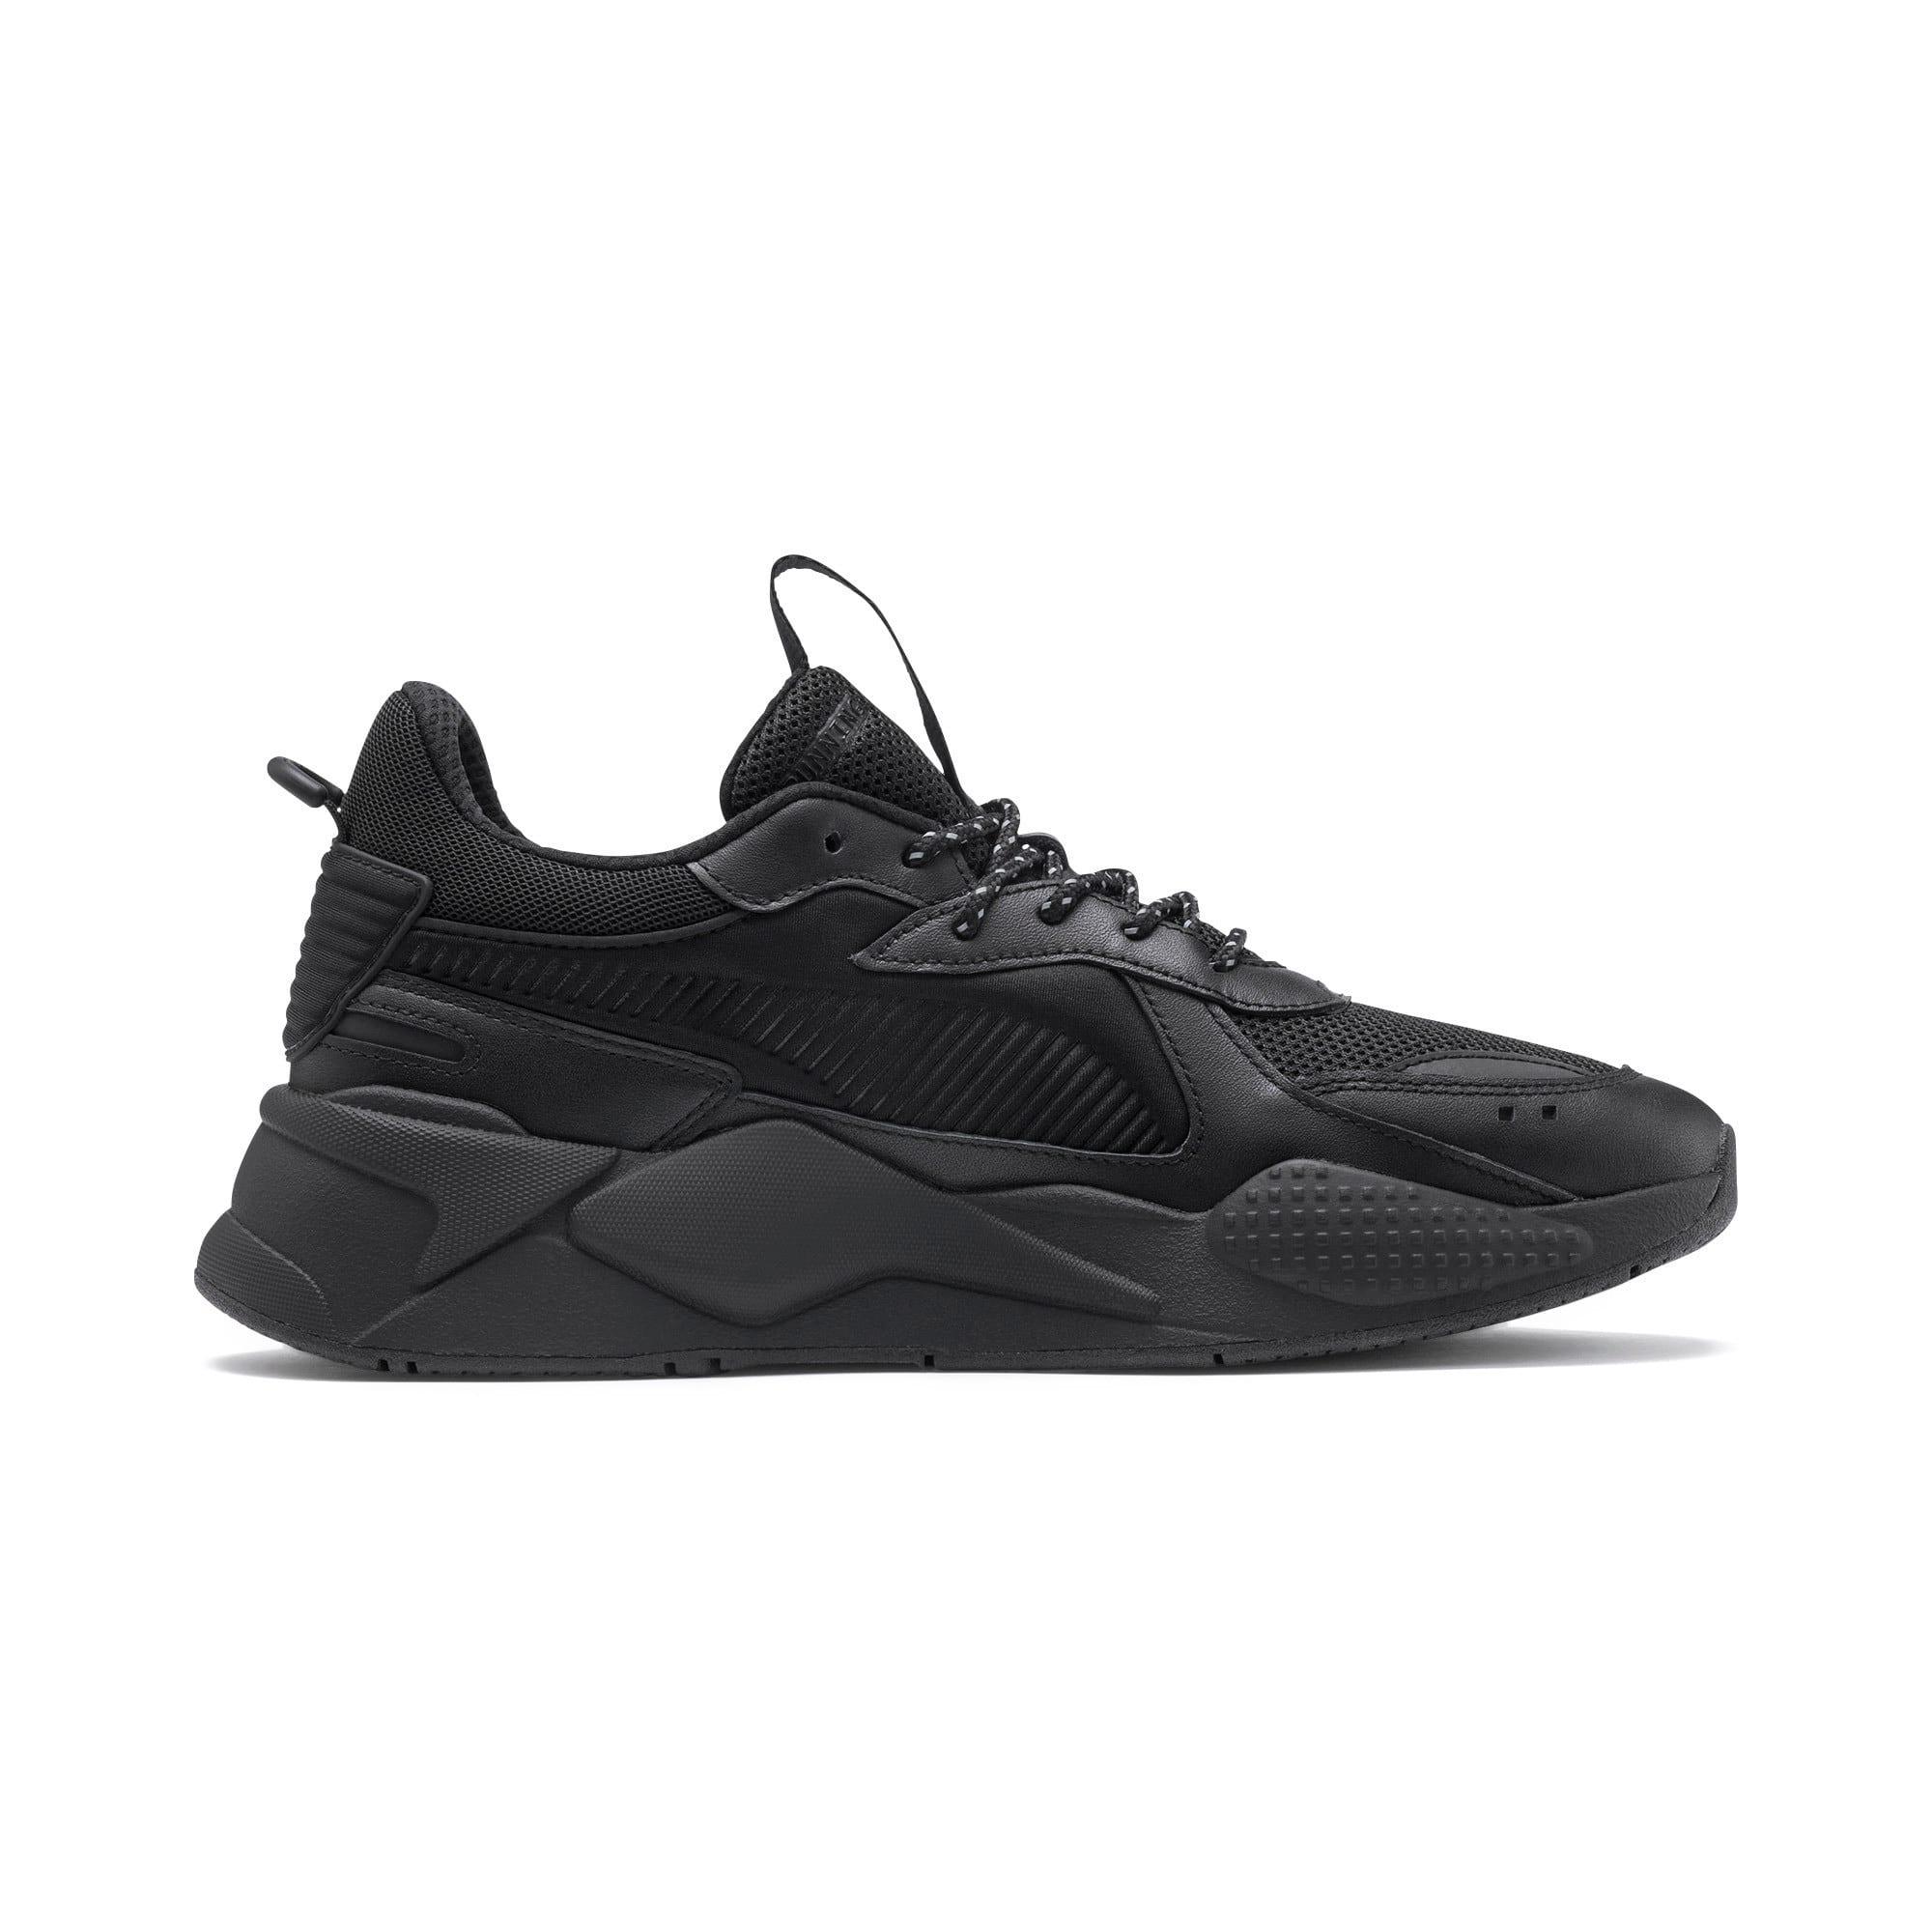 Thumbnail 5 of RS-X Sneaker, Puma Black-Puma Black, medium